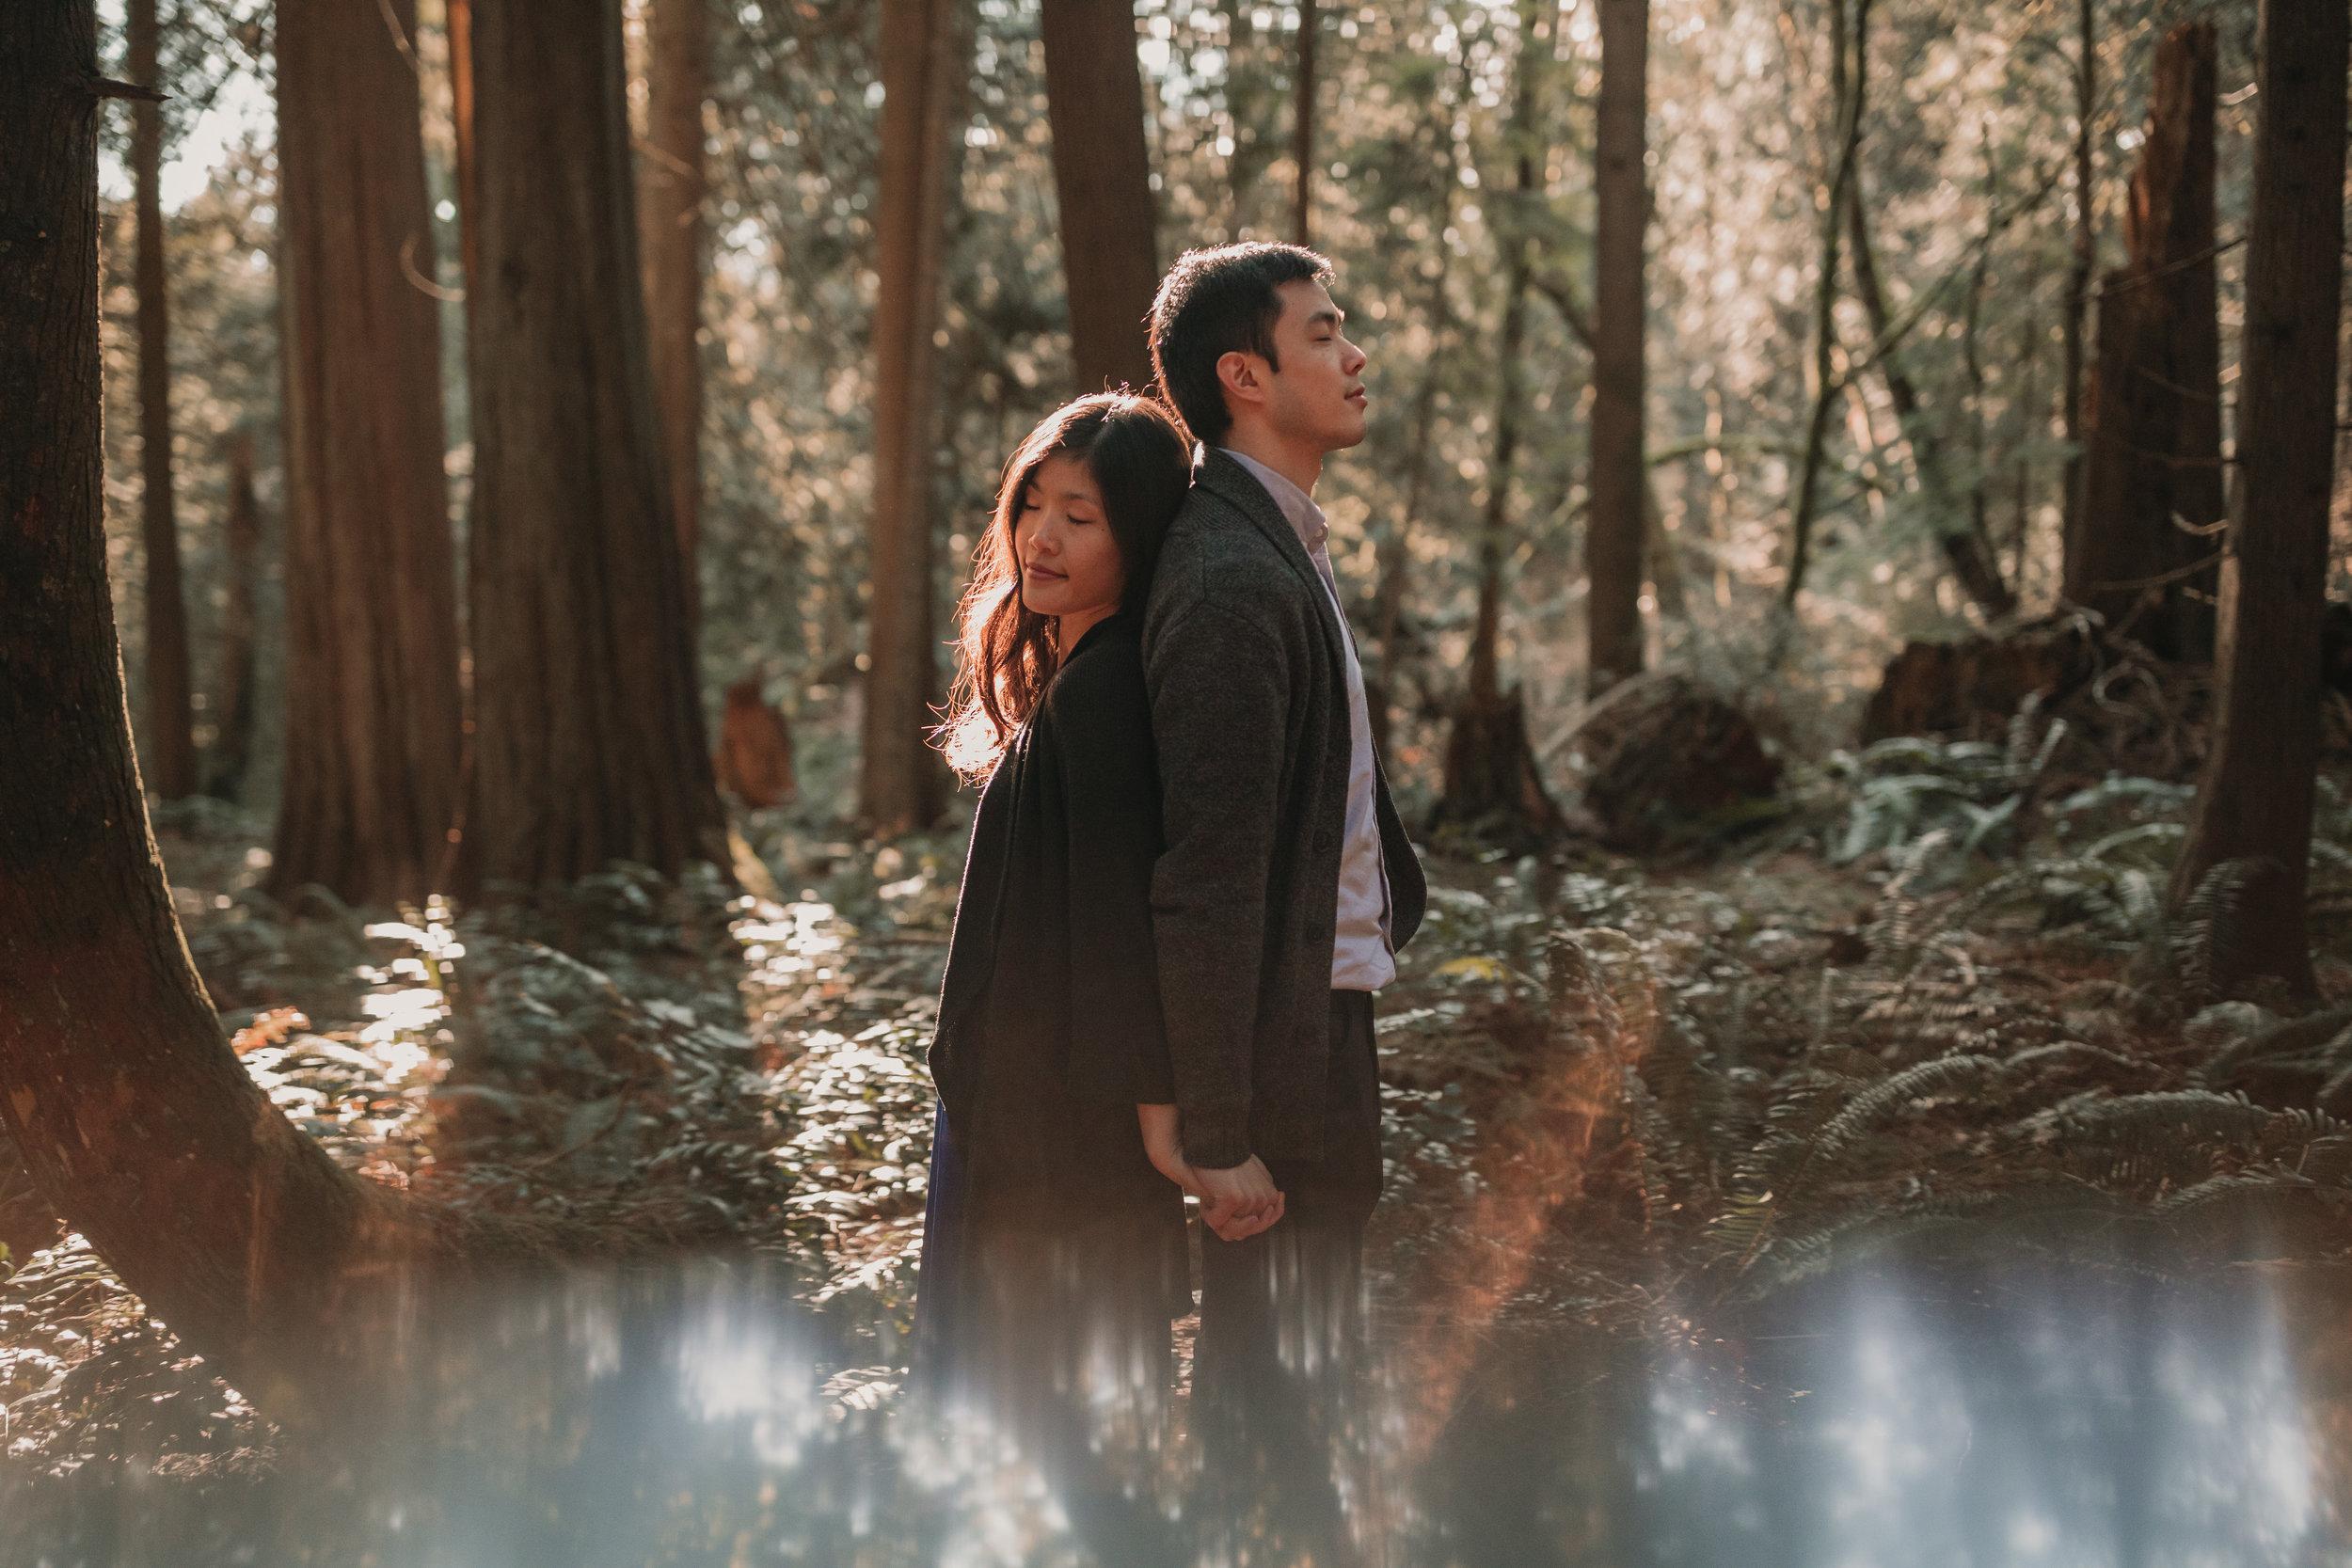 Sunshine Coast Forest Engagement Photos — Jennifer Picard Photography — Vancouver Wedding Photographer & Videographer — 430.JPG